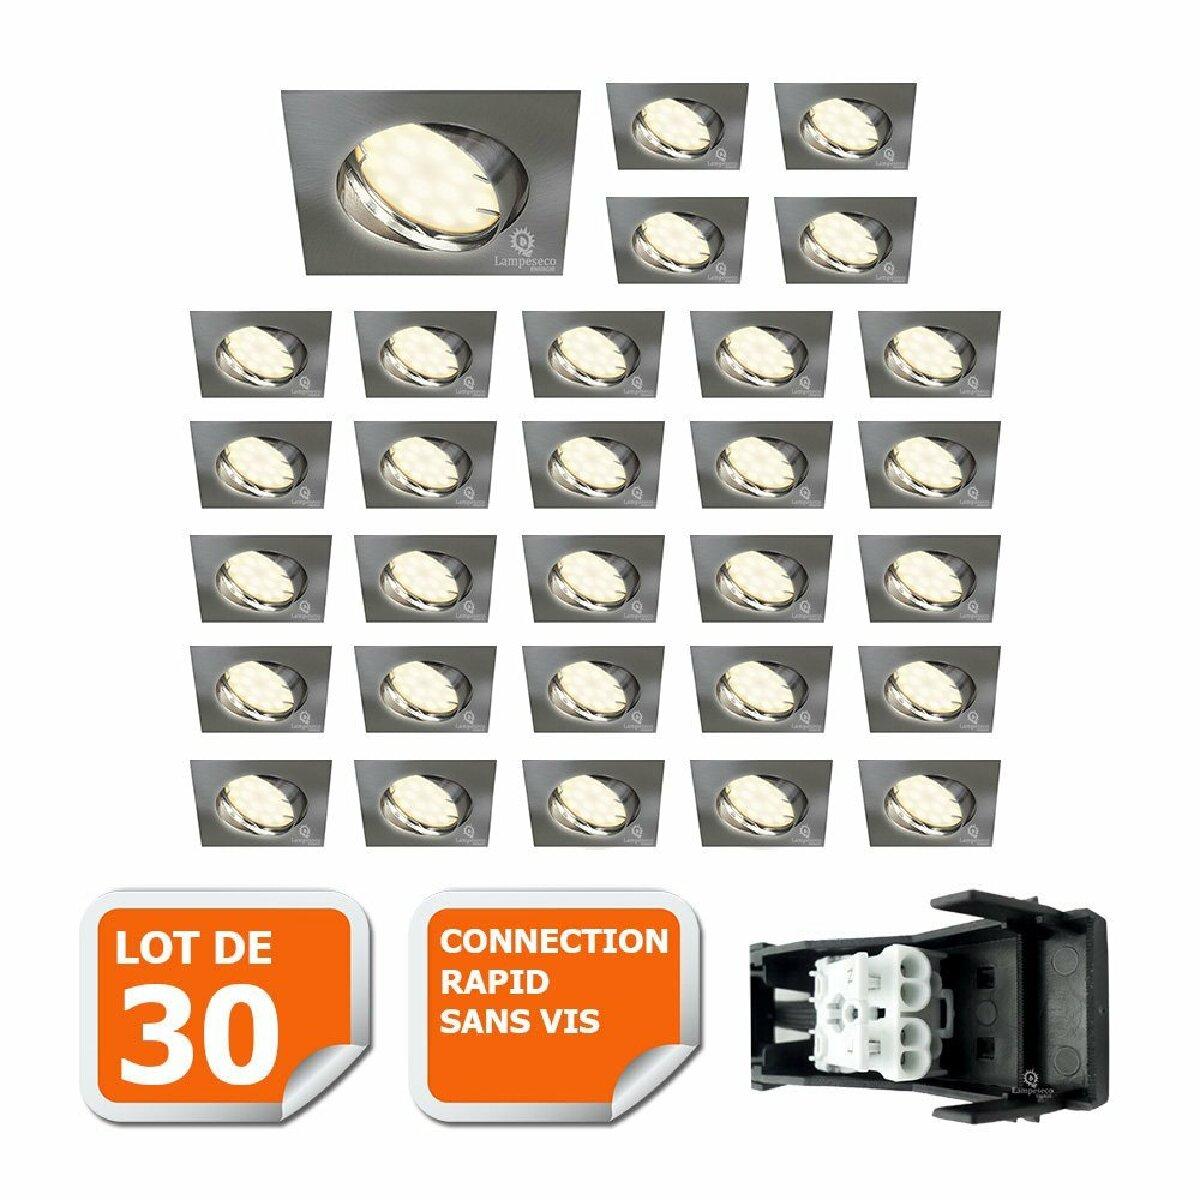 Lampesecoenergie LOT DE 30 SPOT ENCASTRABLE ORIENTABLE LED CARRE ALU BROSSE GU10 230V eq. 50W BLANC CHAUD